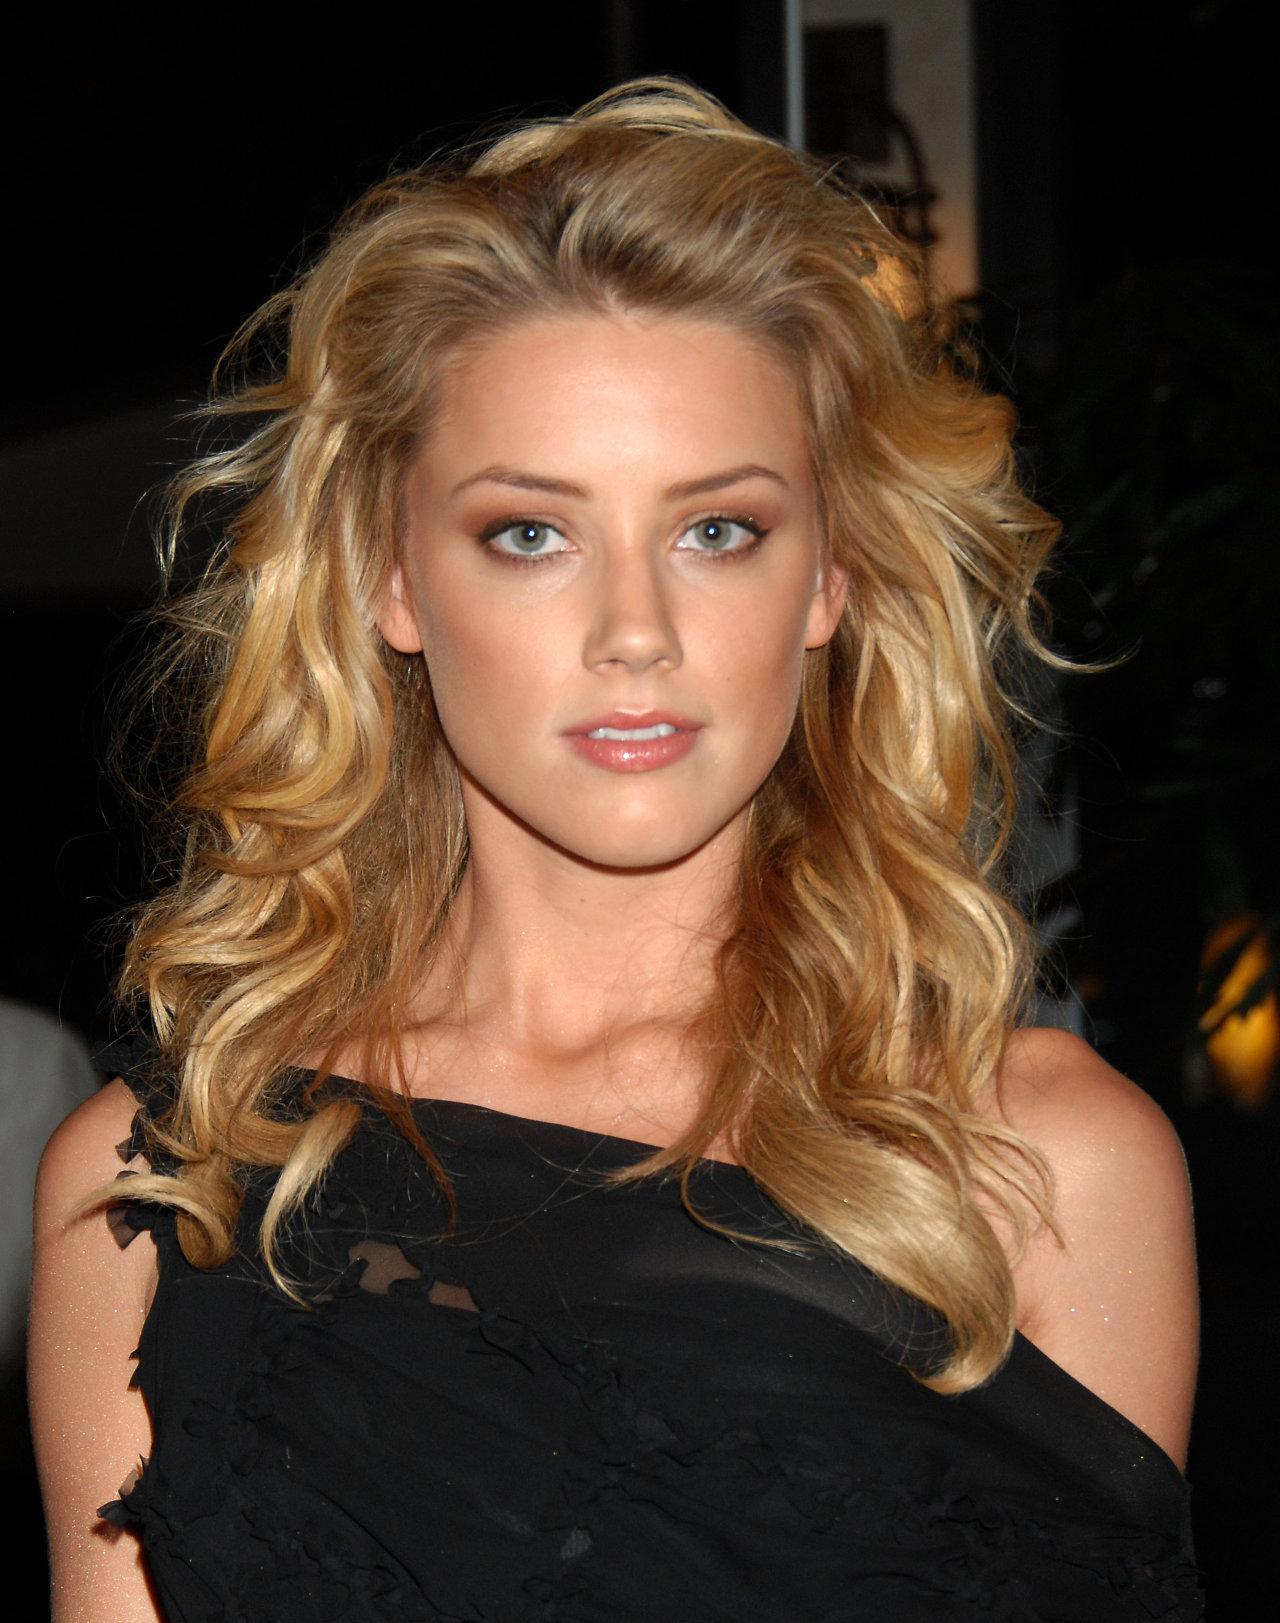 Amber Heard wallpapers (30875). Best Amber Heard pictures Amber Heard